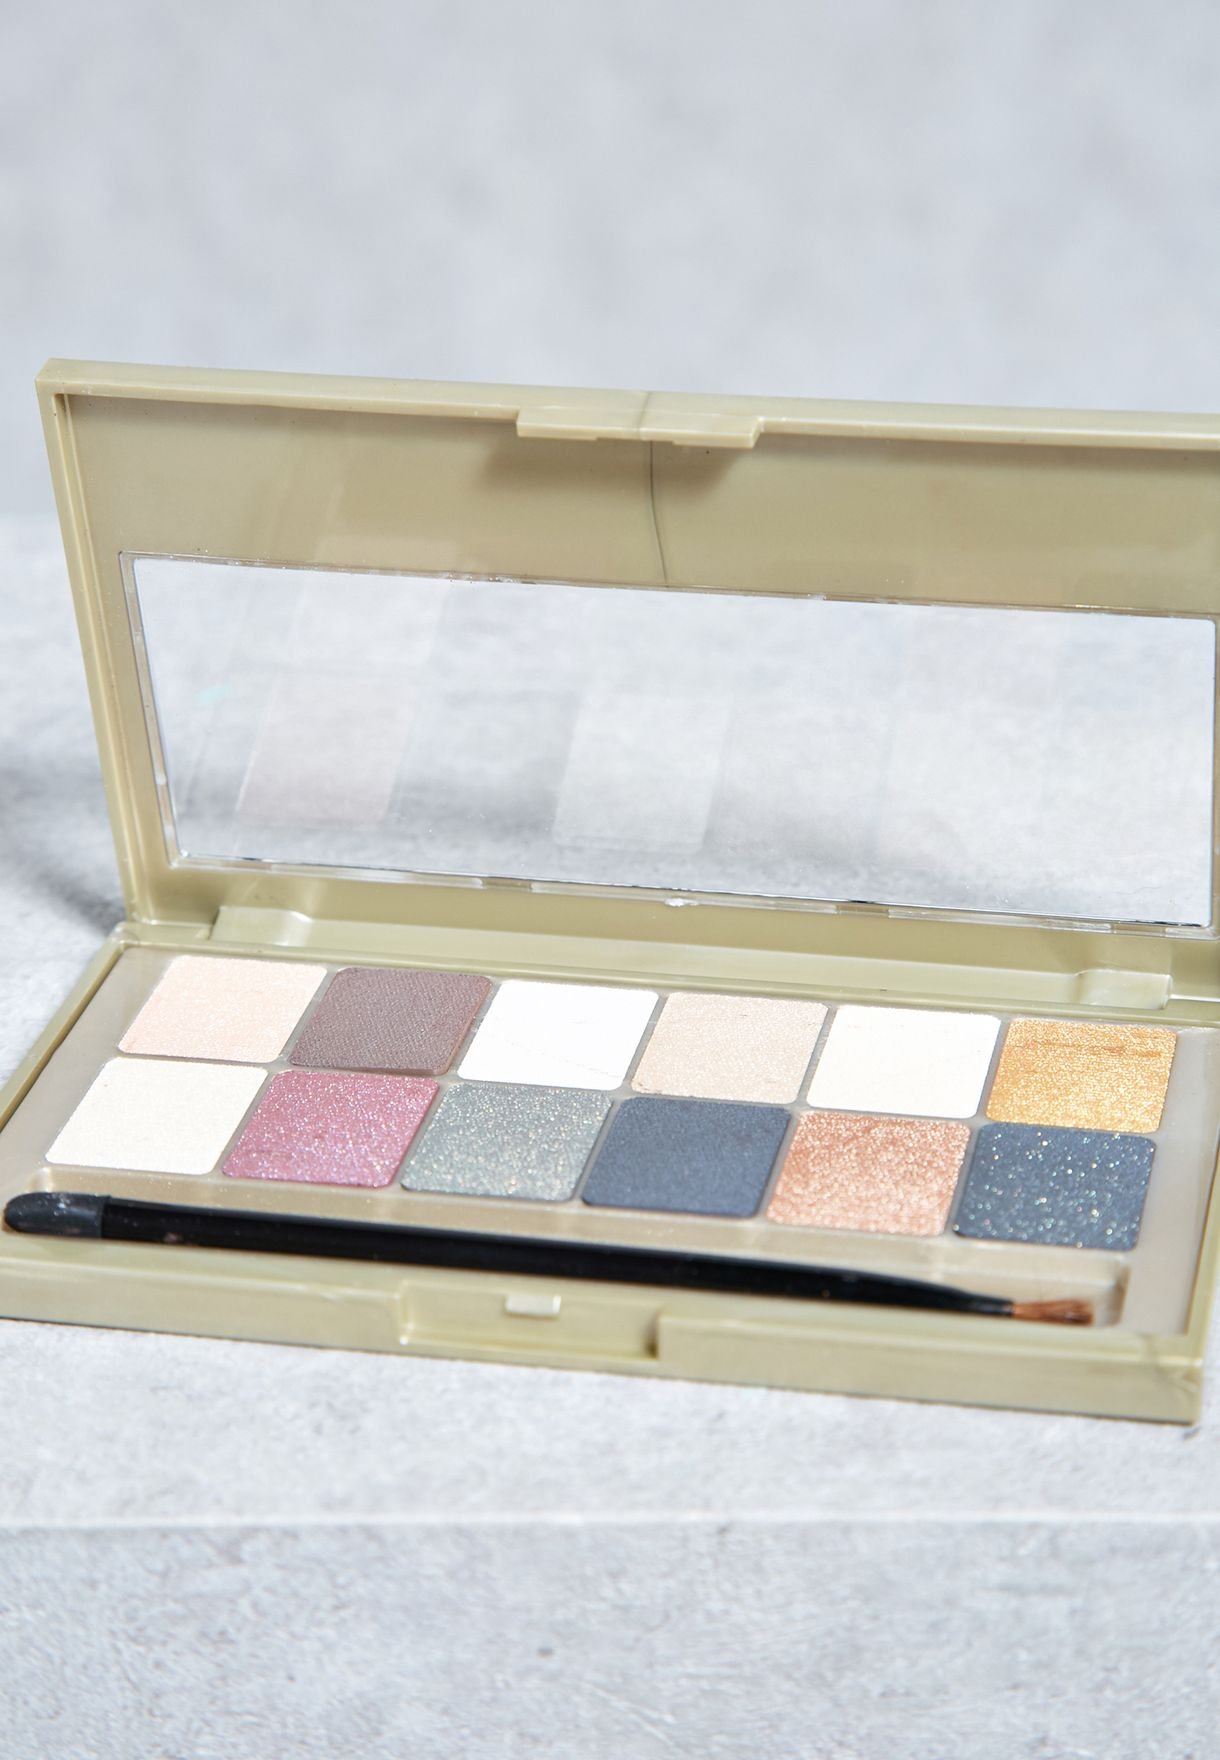 24 Karat Nudes Eye shadow Palette